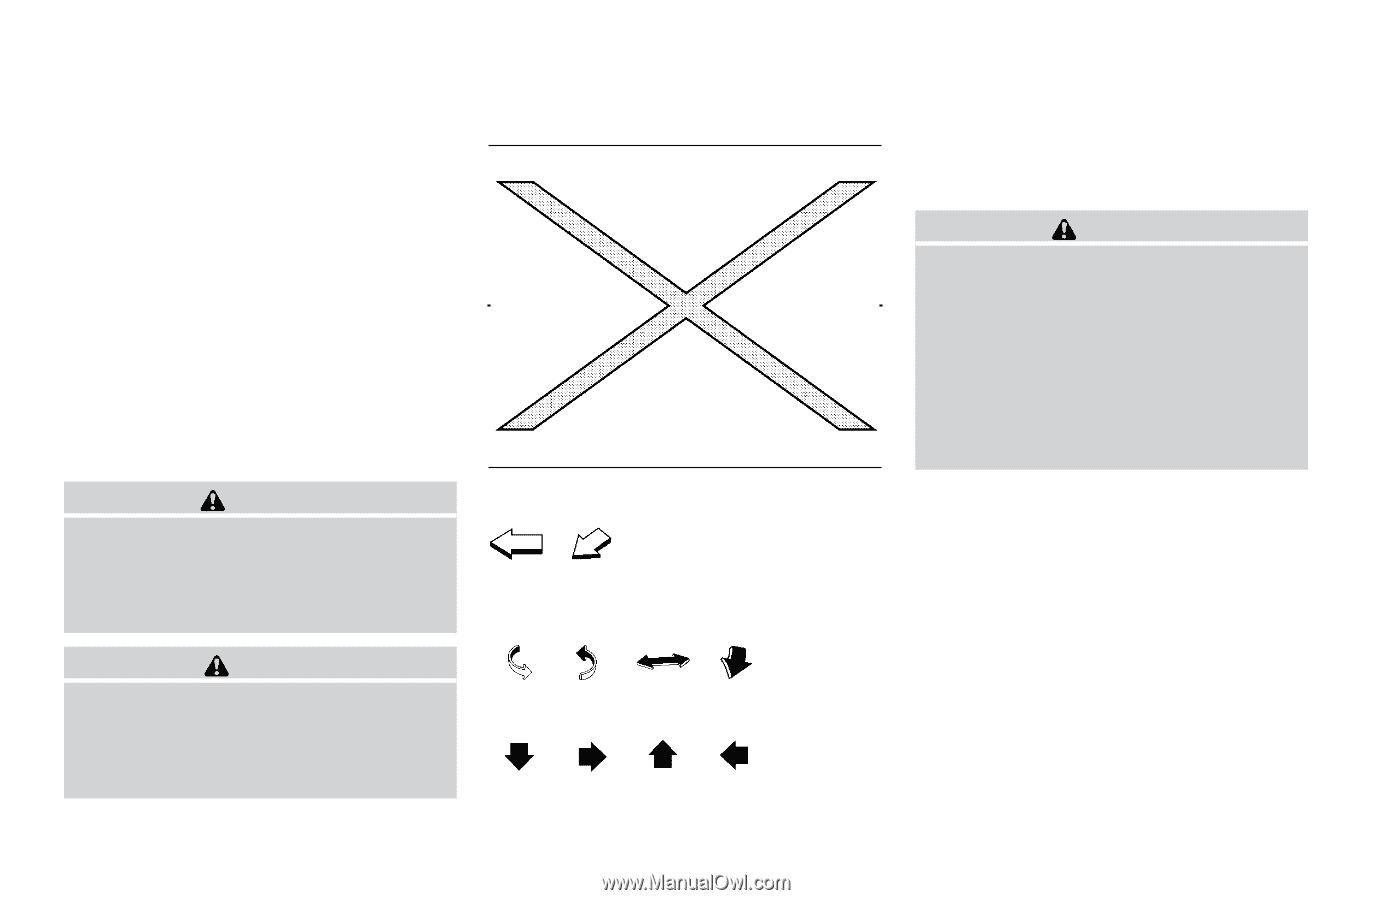 nissan quest 2009 manual